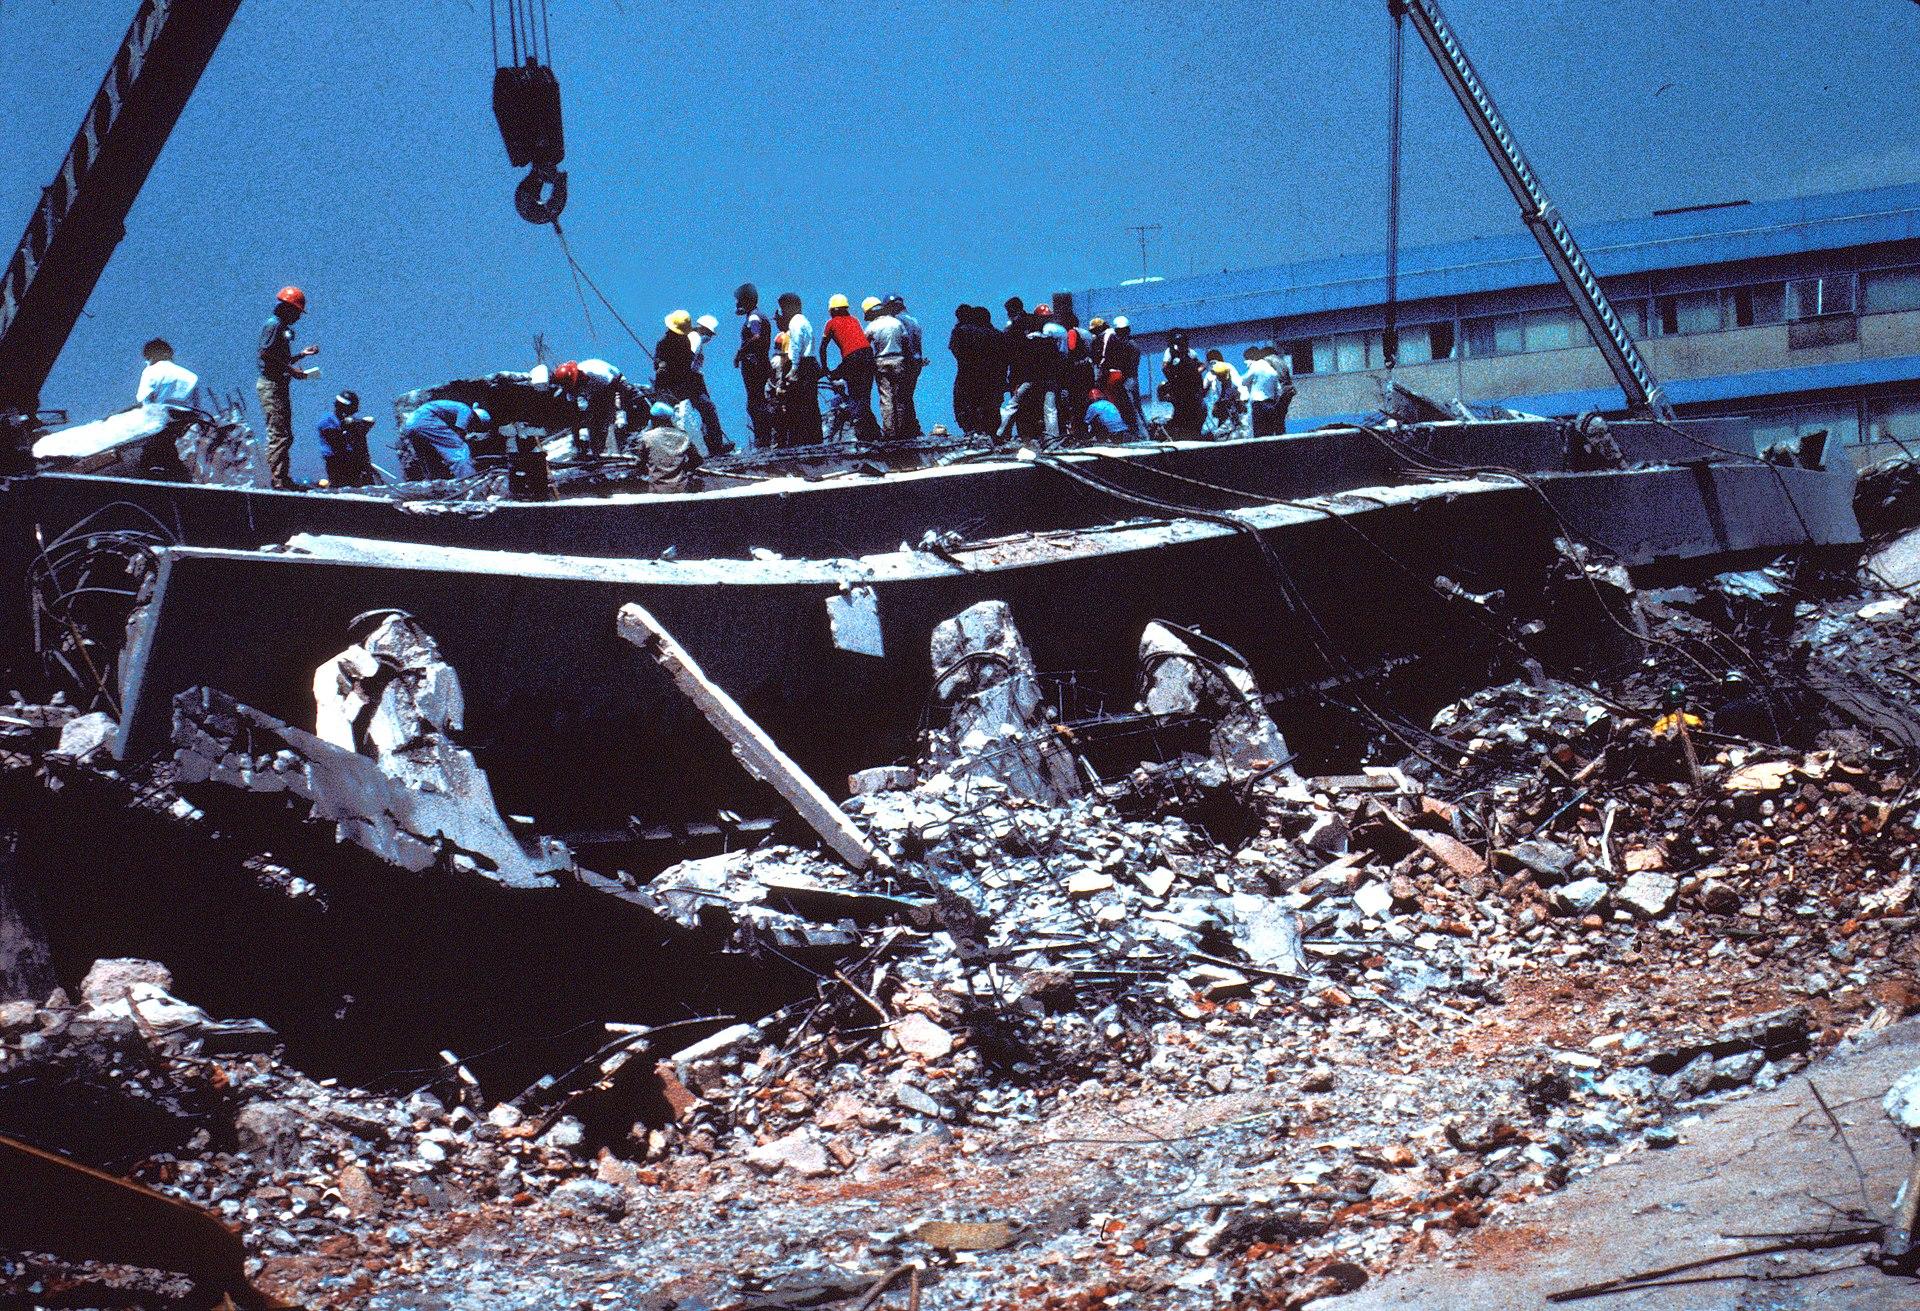 1985 Mexico City earthquake - Wikipedia